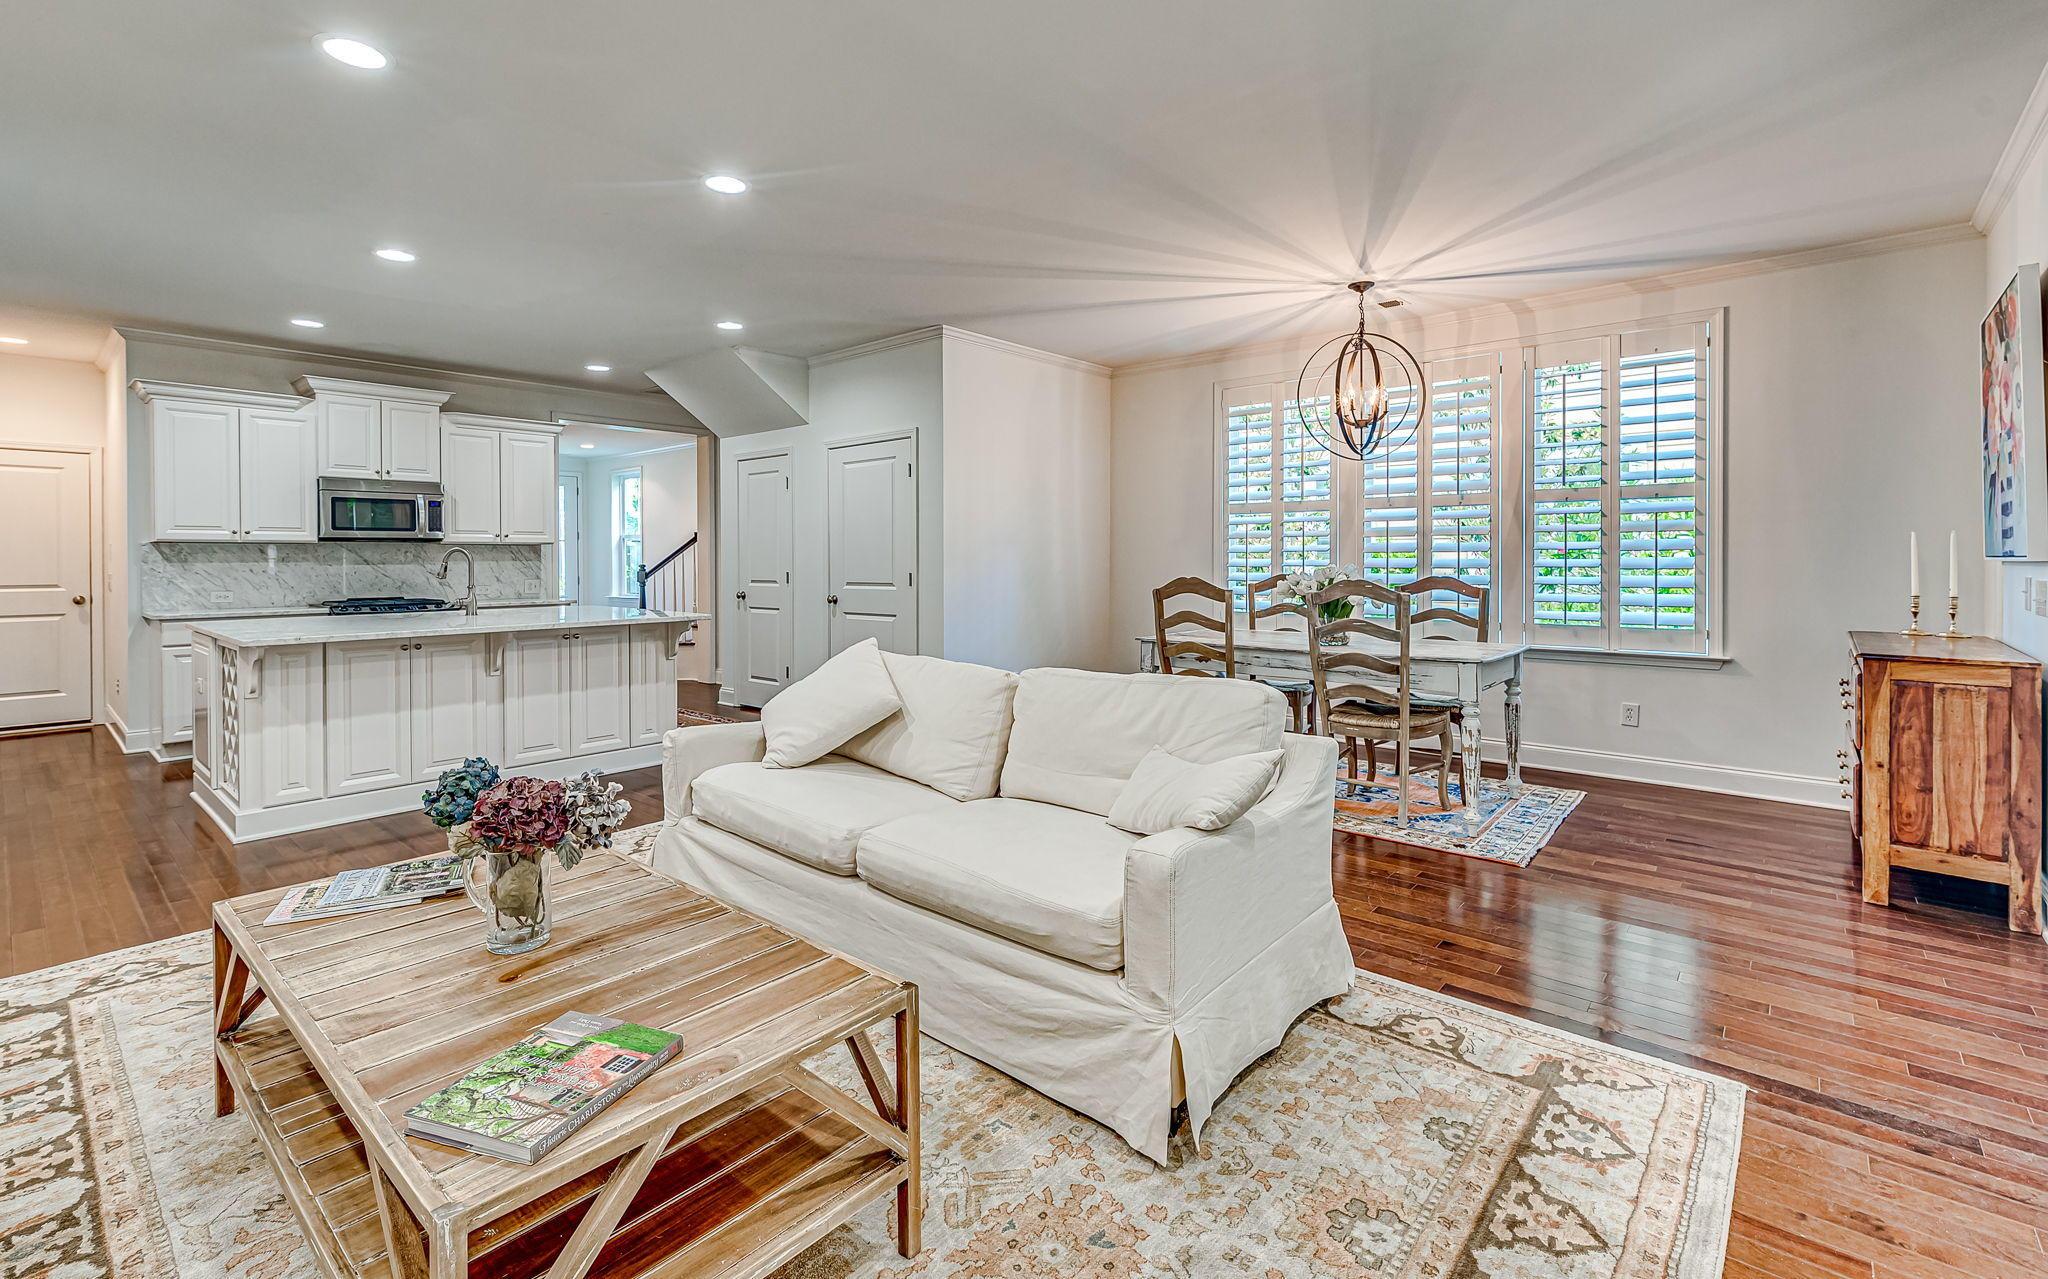 Dunes West Homes For Sale - 2476 Kings Gate, Mount Pleasant, SC - 0